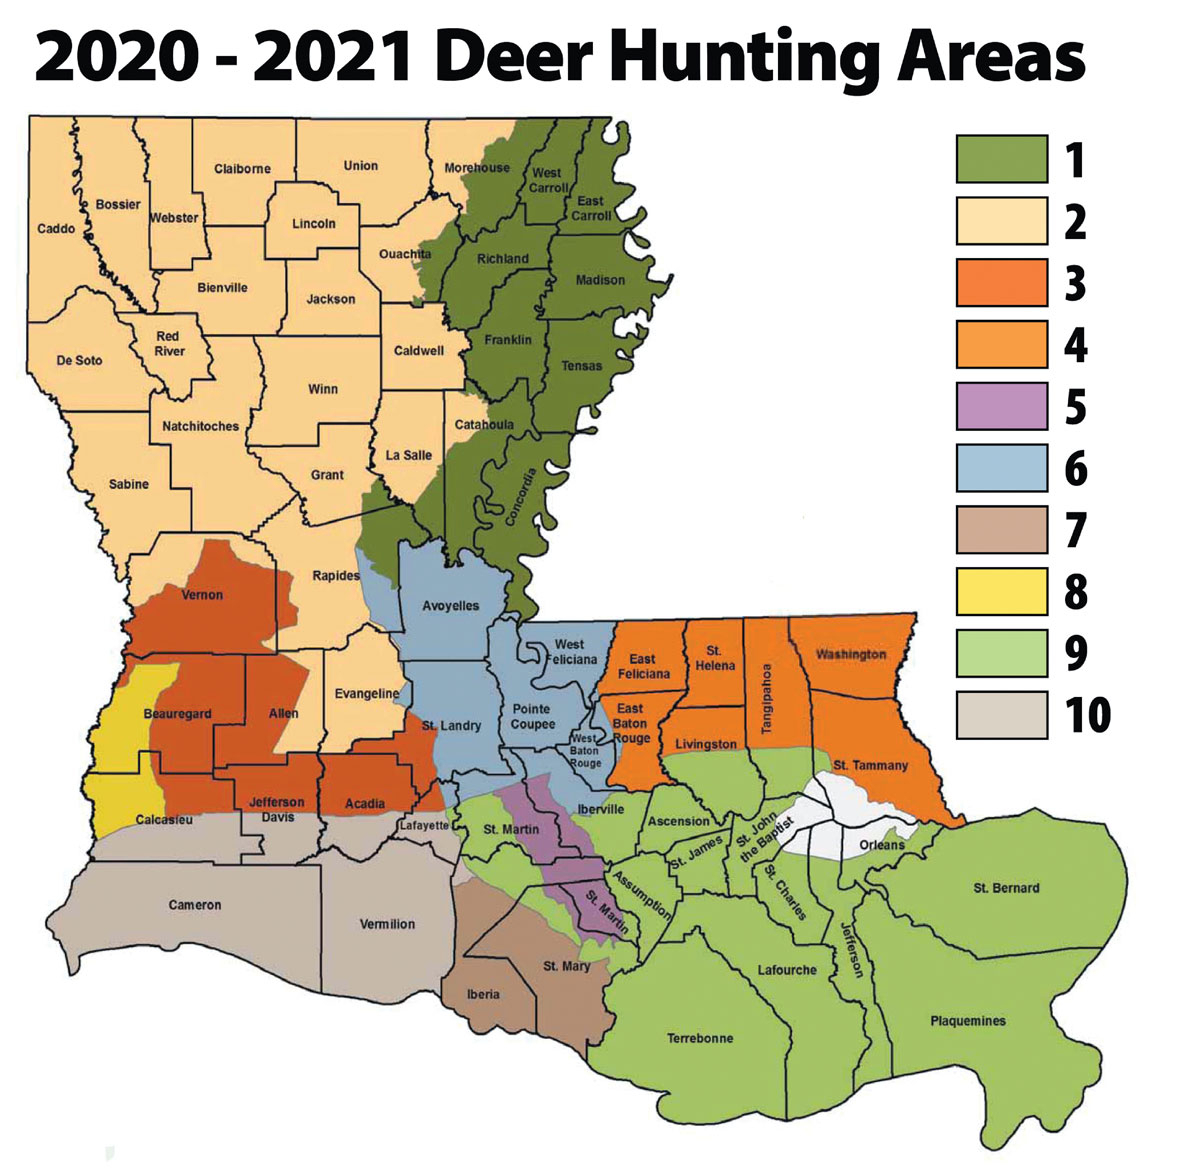 Louisiana'S 2020 Rut Report - Louisiana Sportsman in Rut Prediction 2021